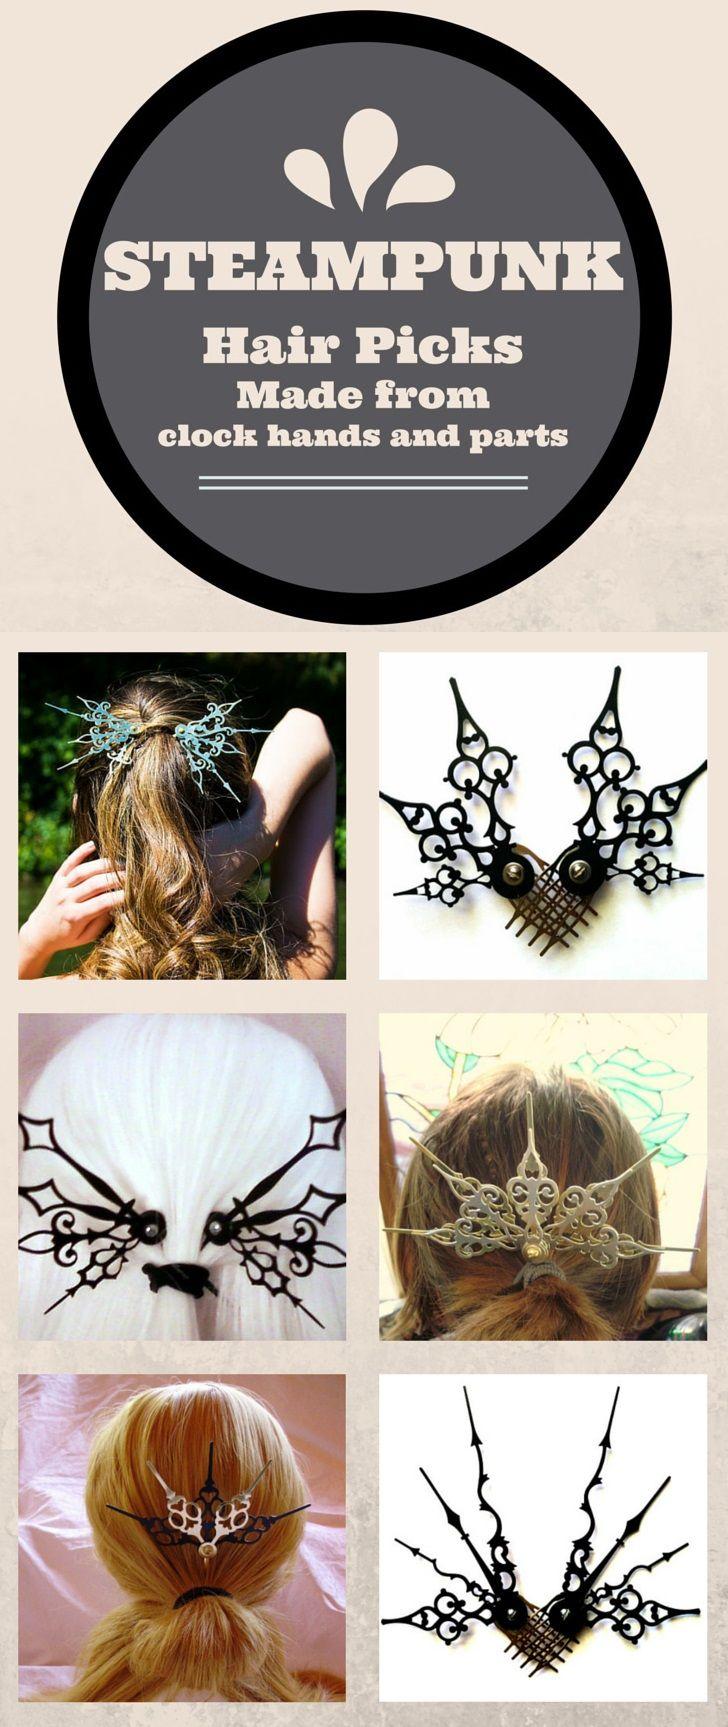 Clockwork Hair Accessories Love This Style Pinterest Accessori